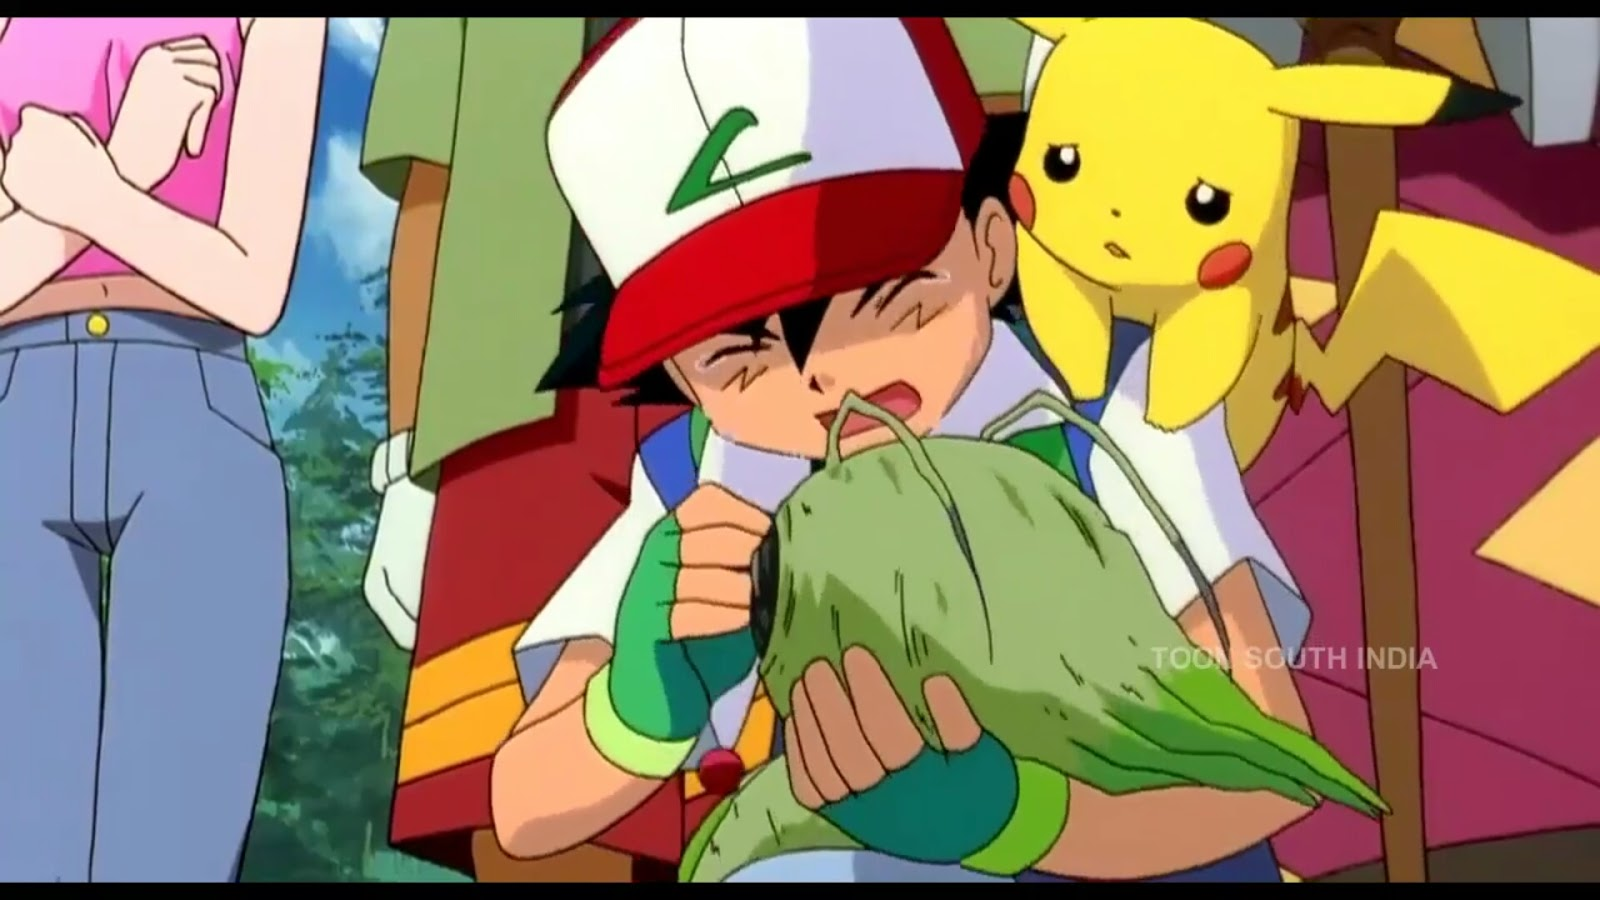 Pokémon 4Ever: Celebi - Voice of the Forest Tamil Dubbed